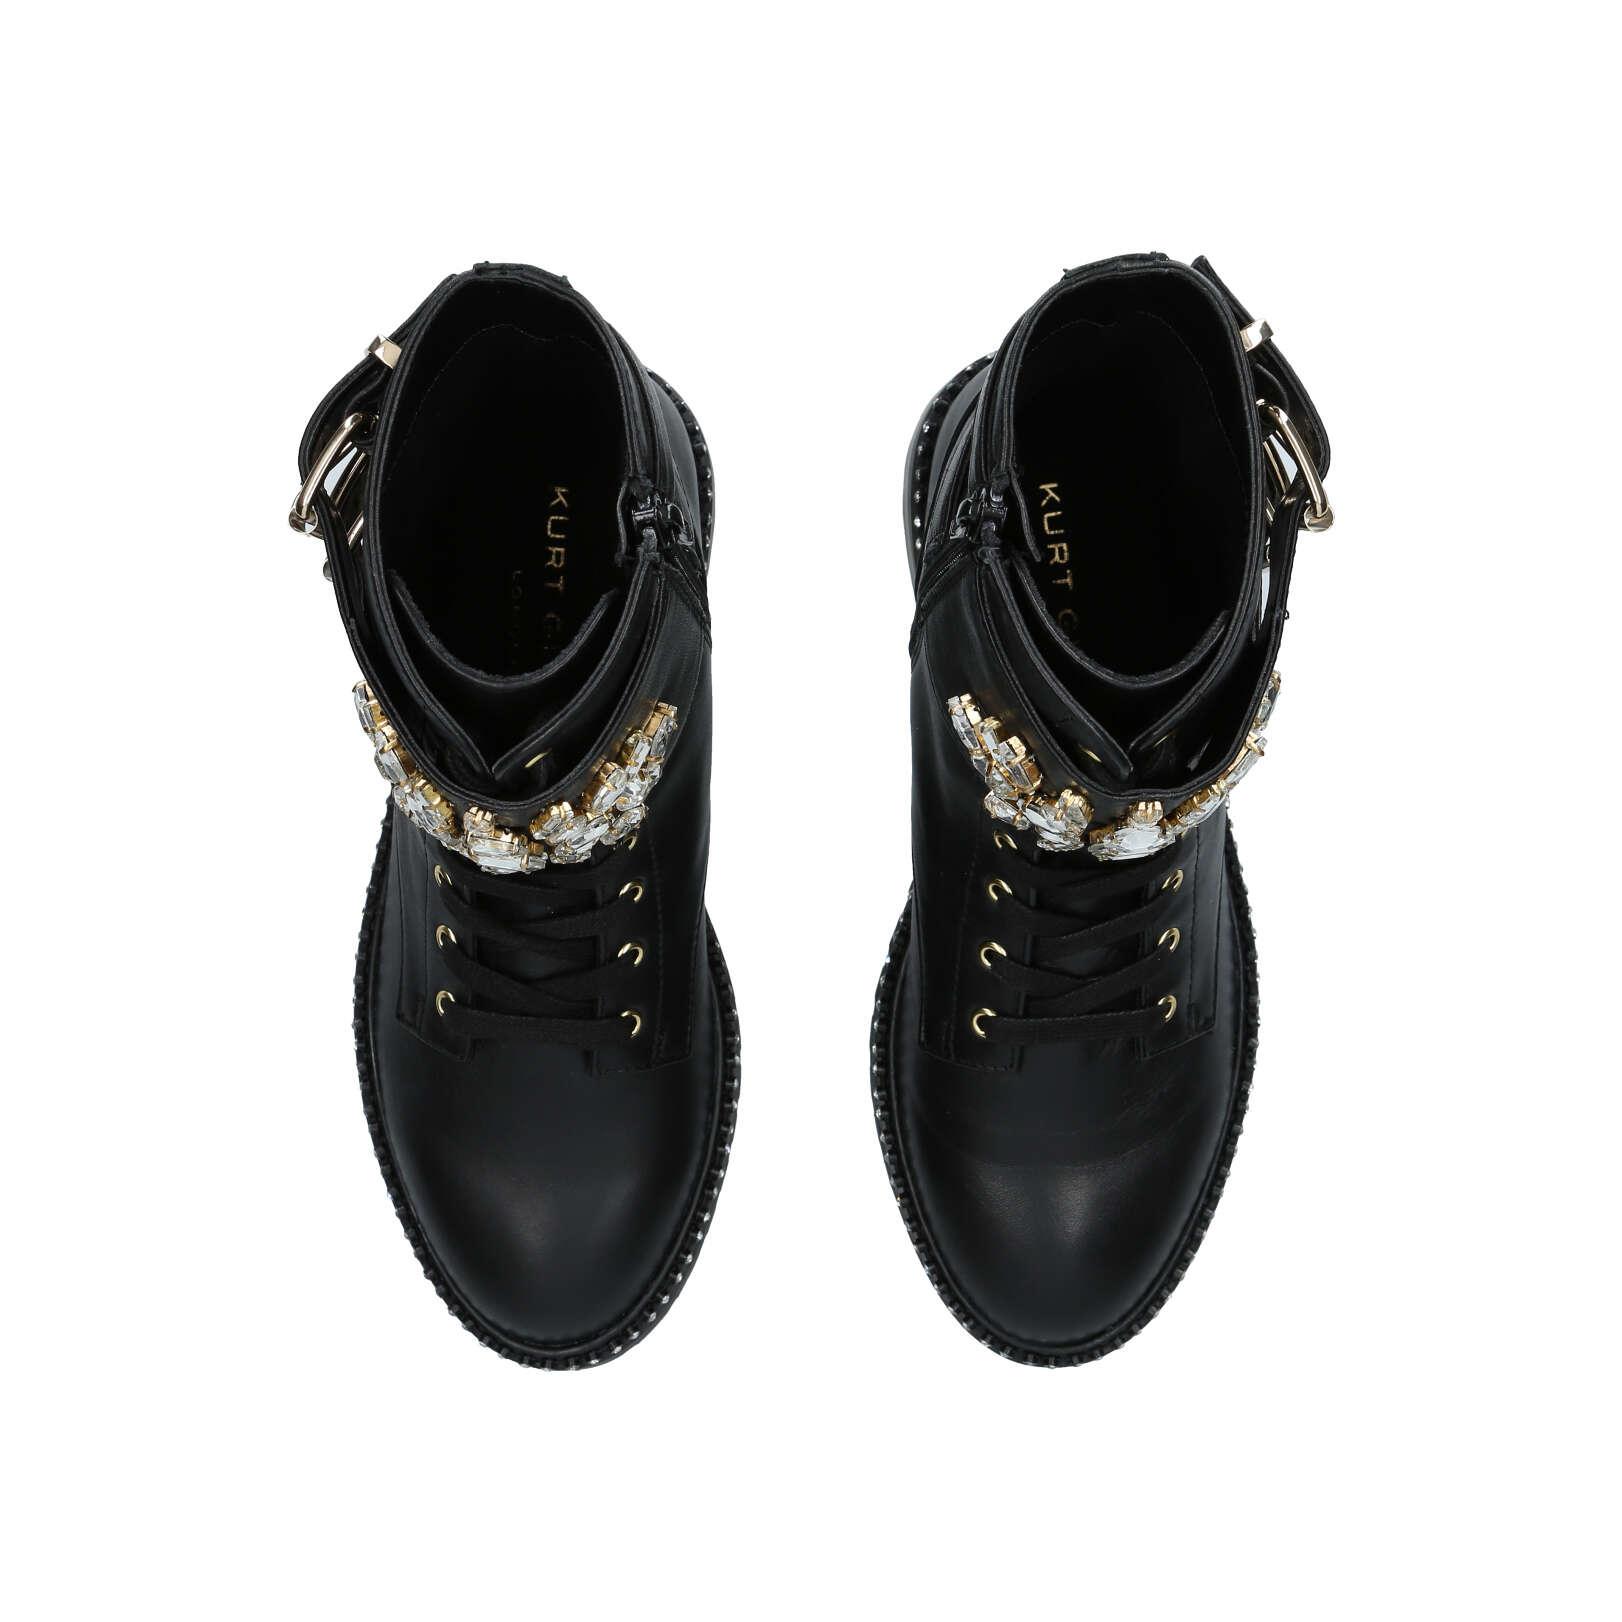 STOOP - KURT GEIGER LONDON Ankle Boots